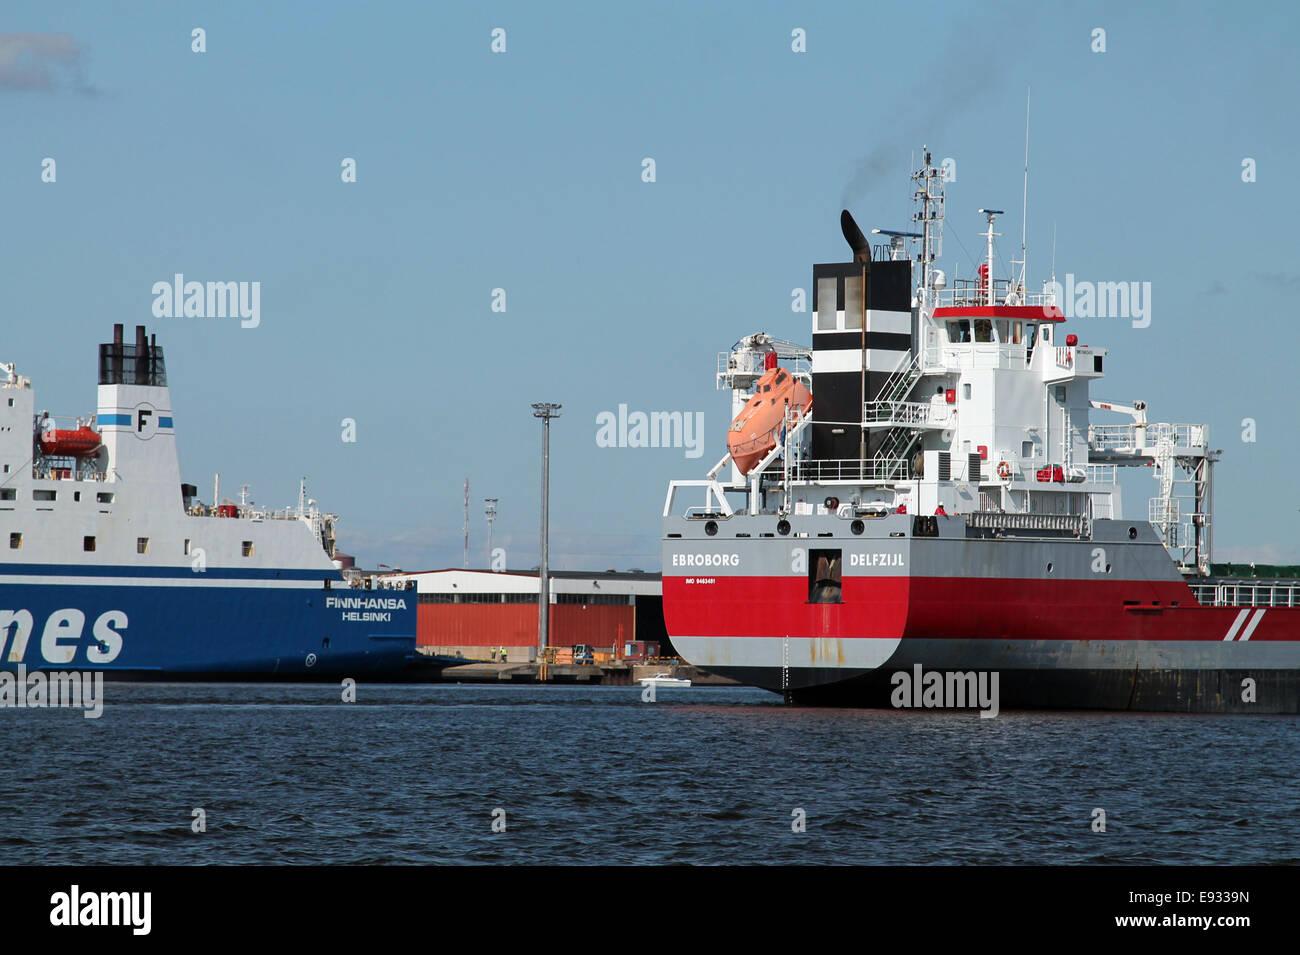 Kotka, Finland, merchant ships in harbour - Stock Image